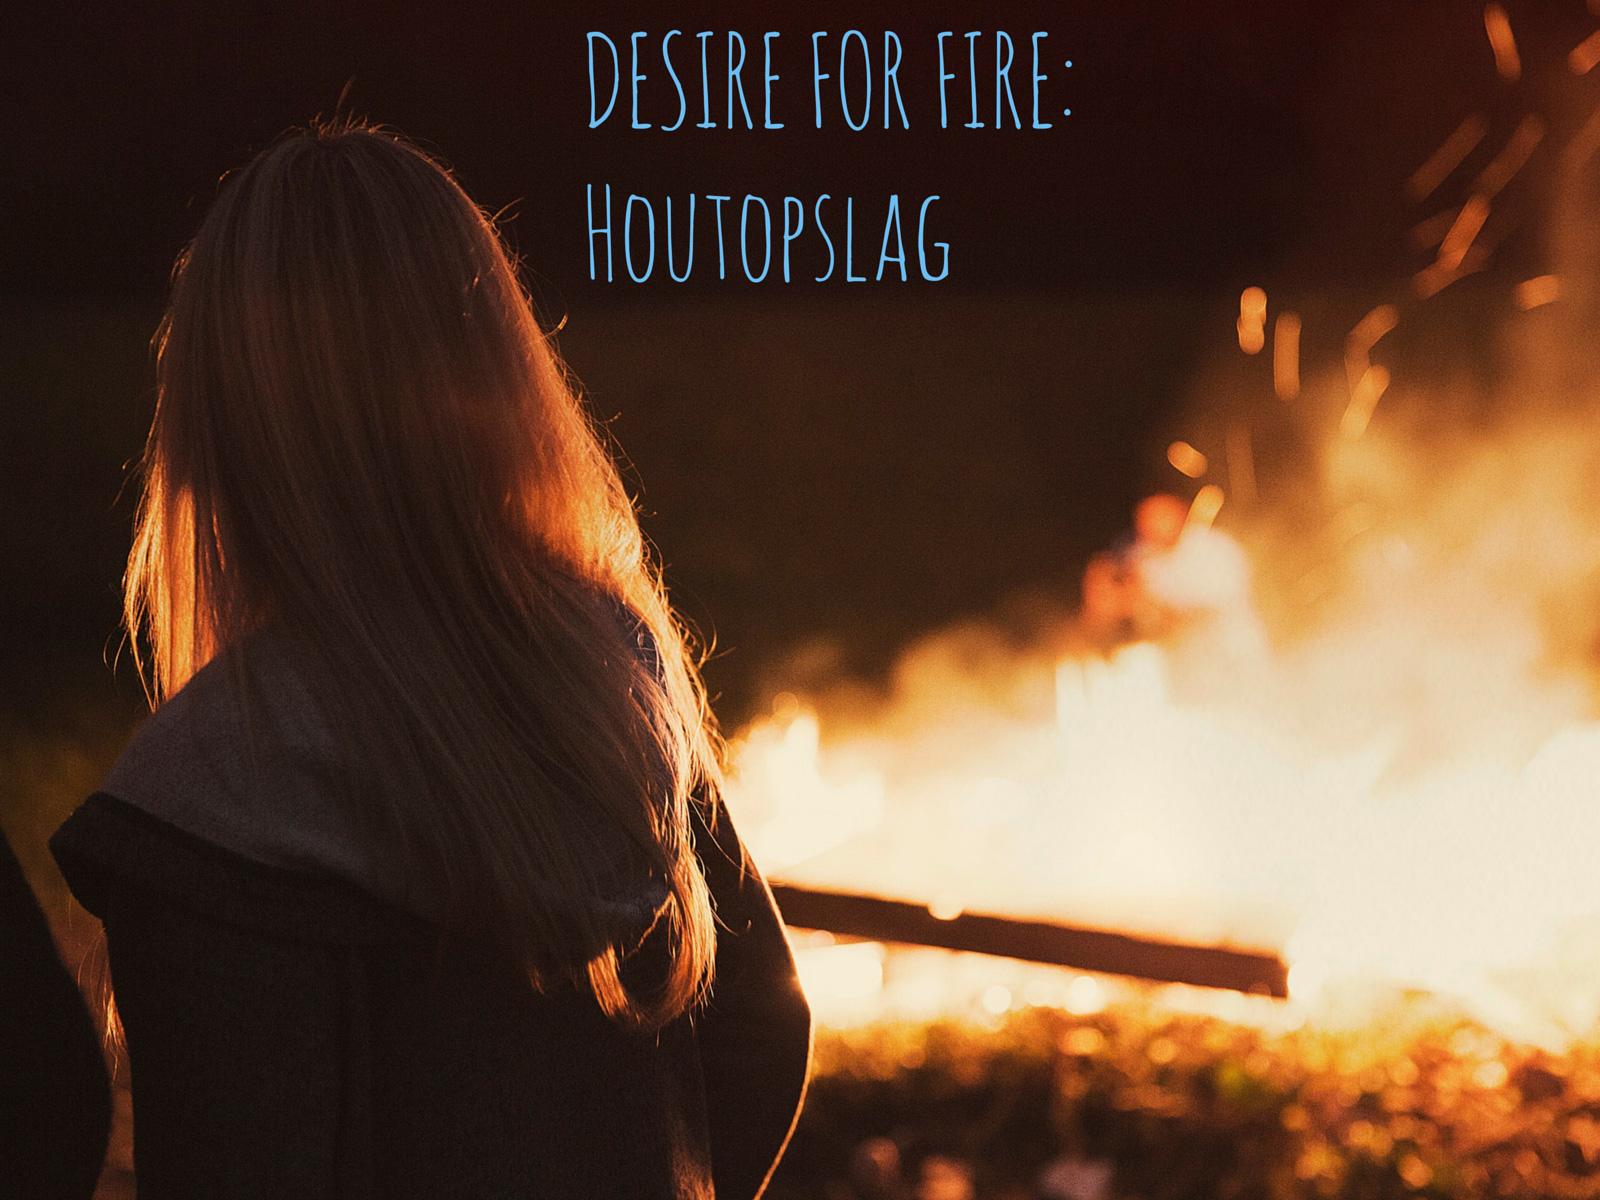 Desire for fire! Verscheidene mooie manieren om hout op te slaan